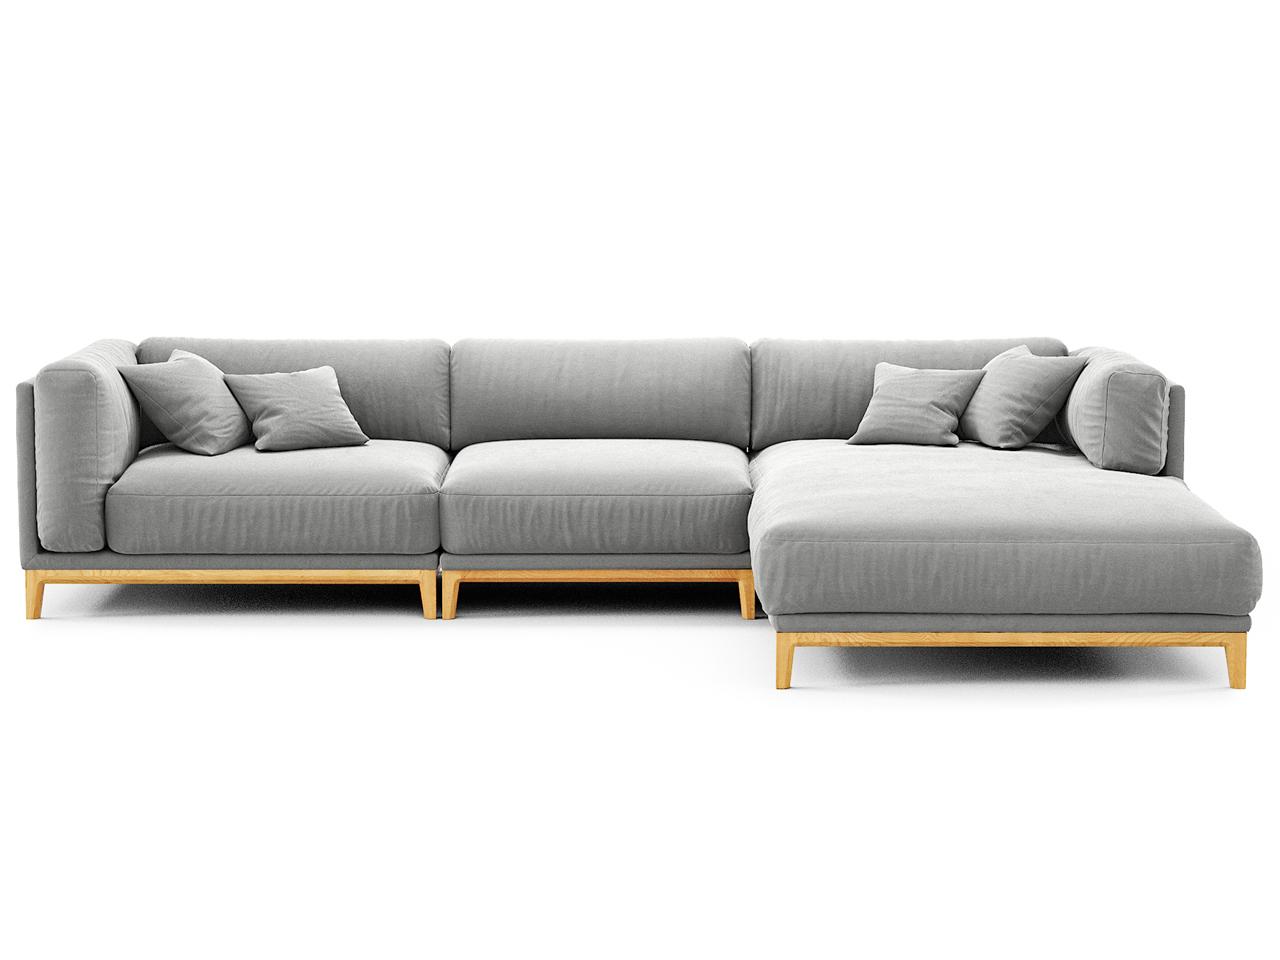 The idea диван case серый 108256/5